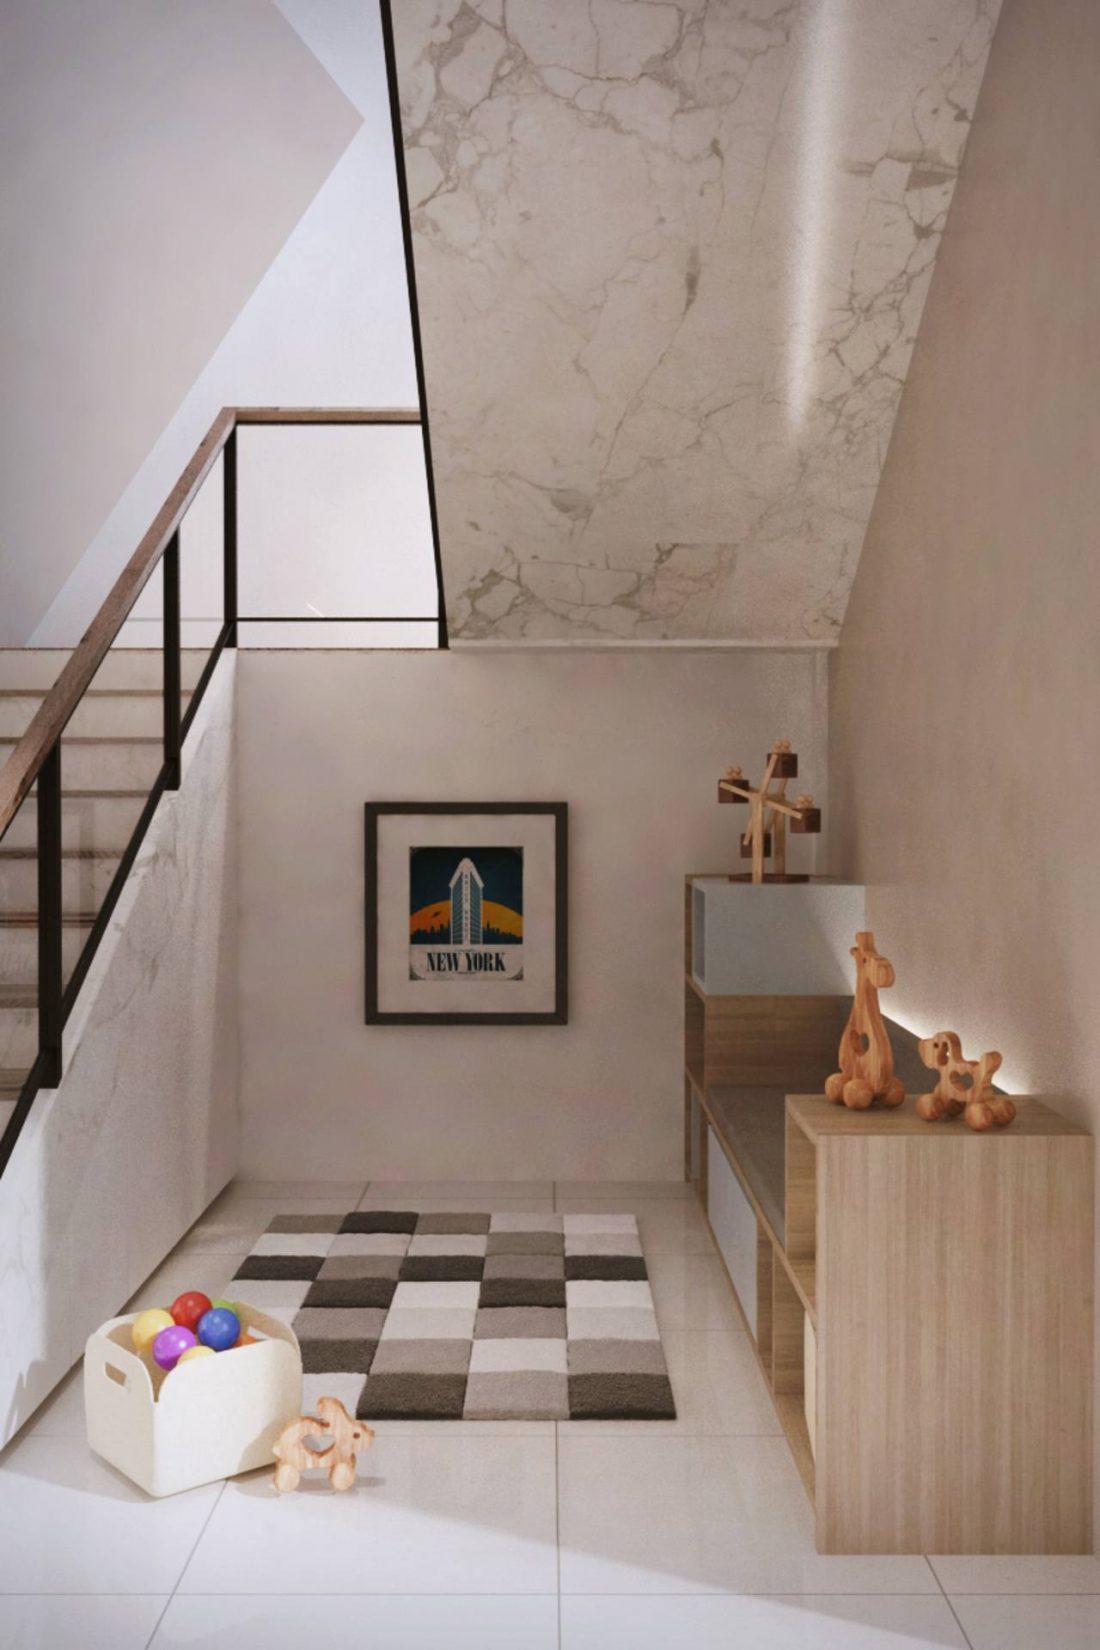 Interior Design Private Bungalow Alor Setar Kedah Malaysia Kid Room Design v1